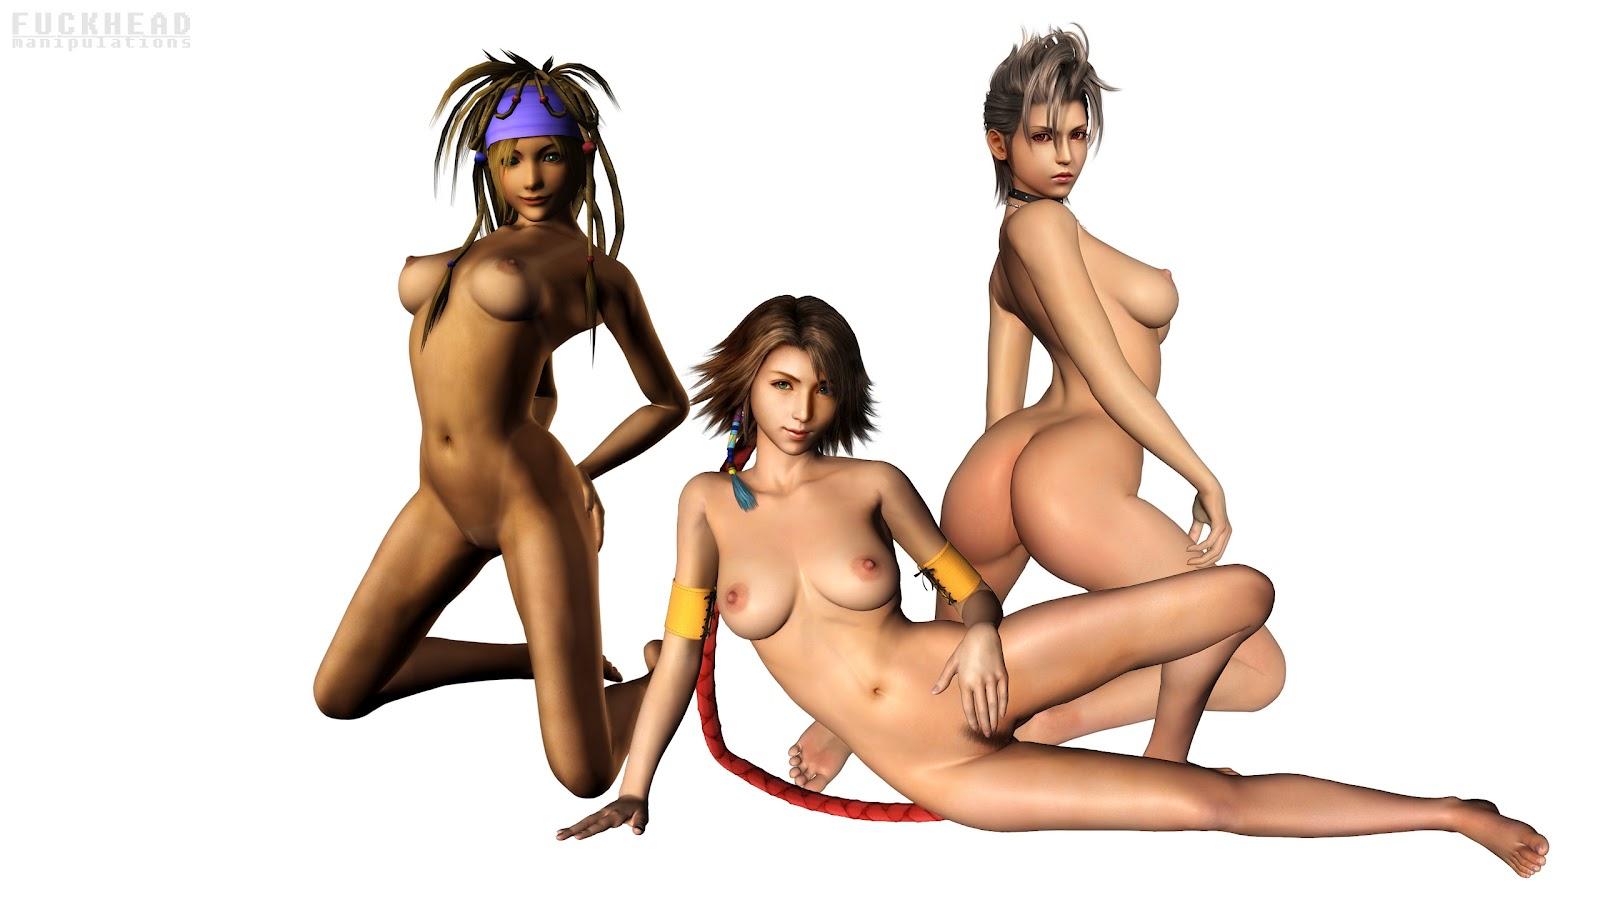 Fuking position cartoon videos erotica tube